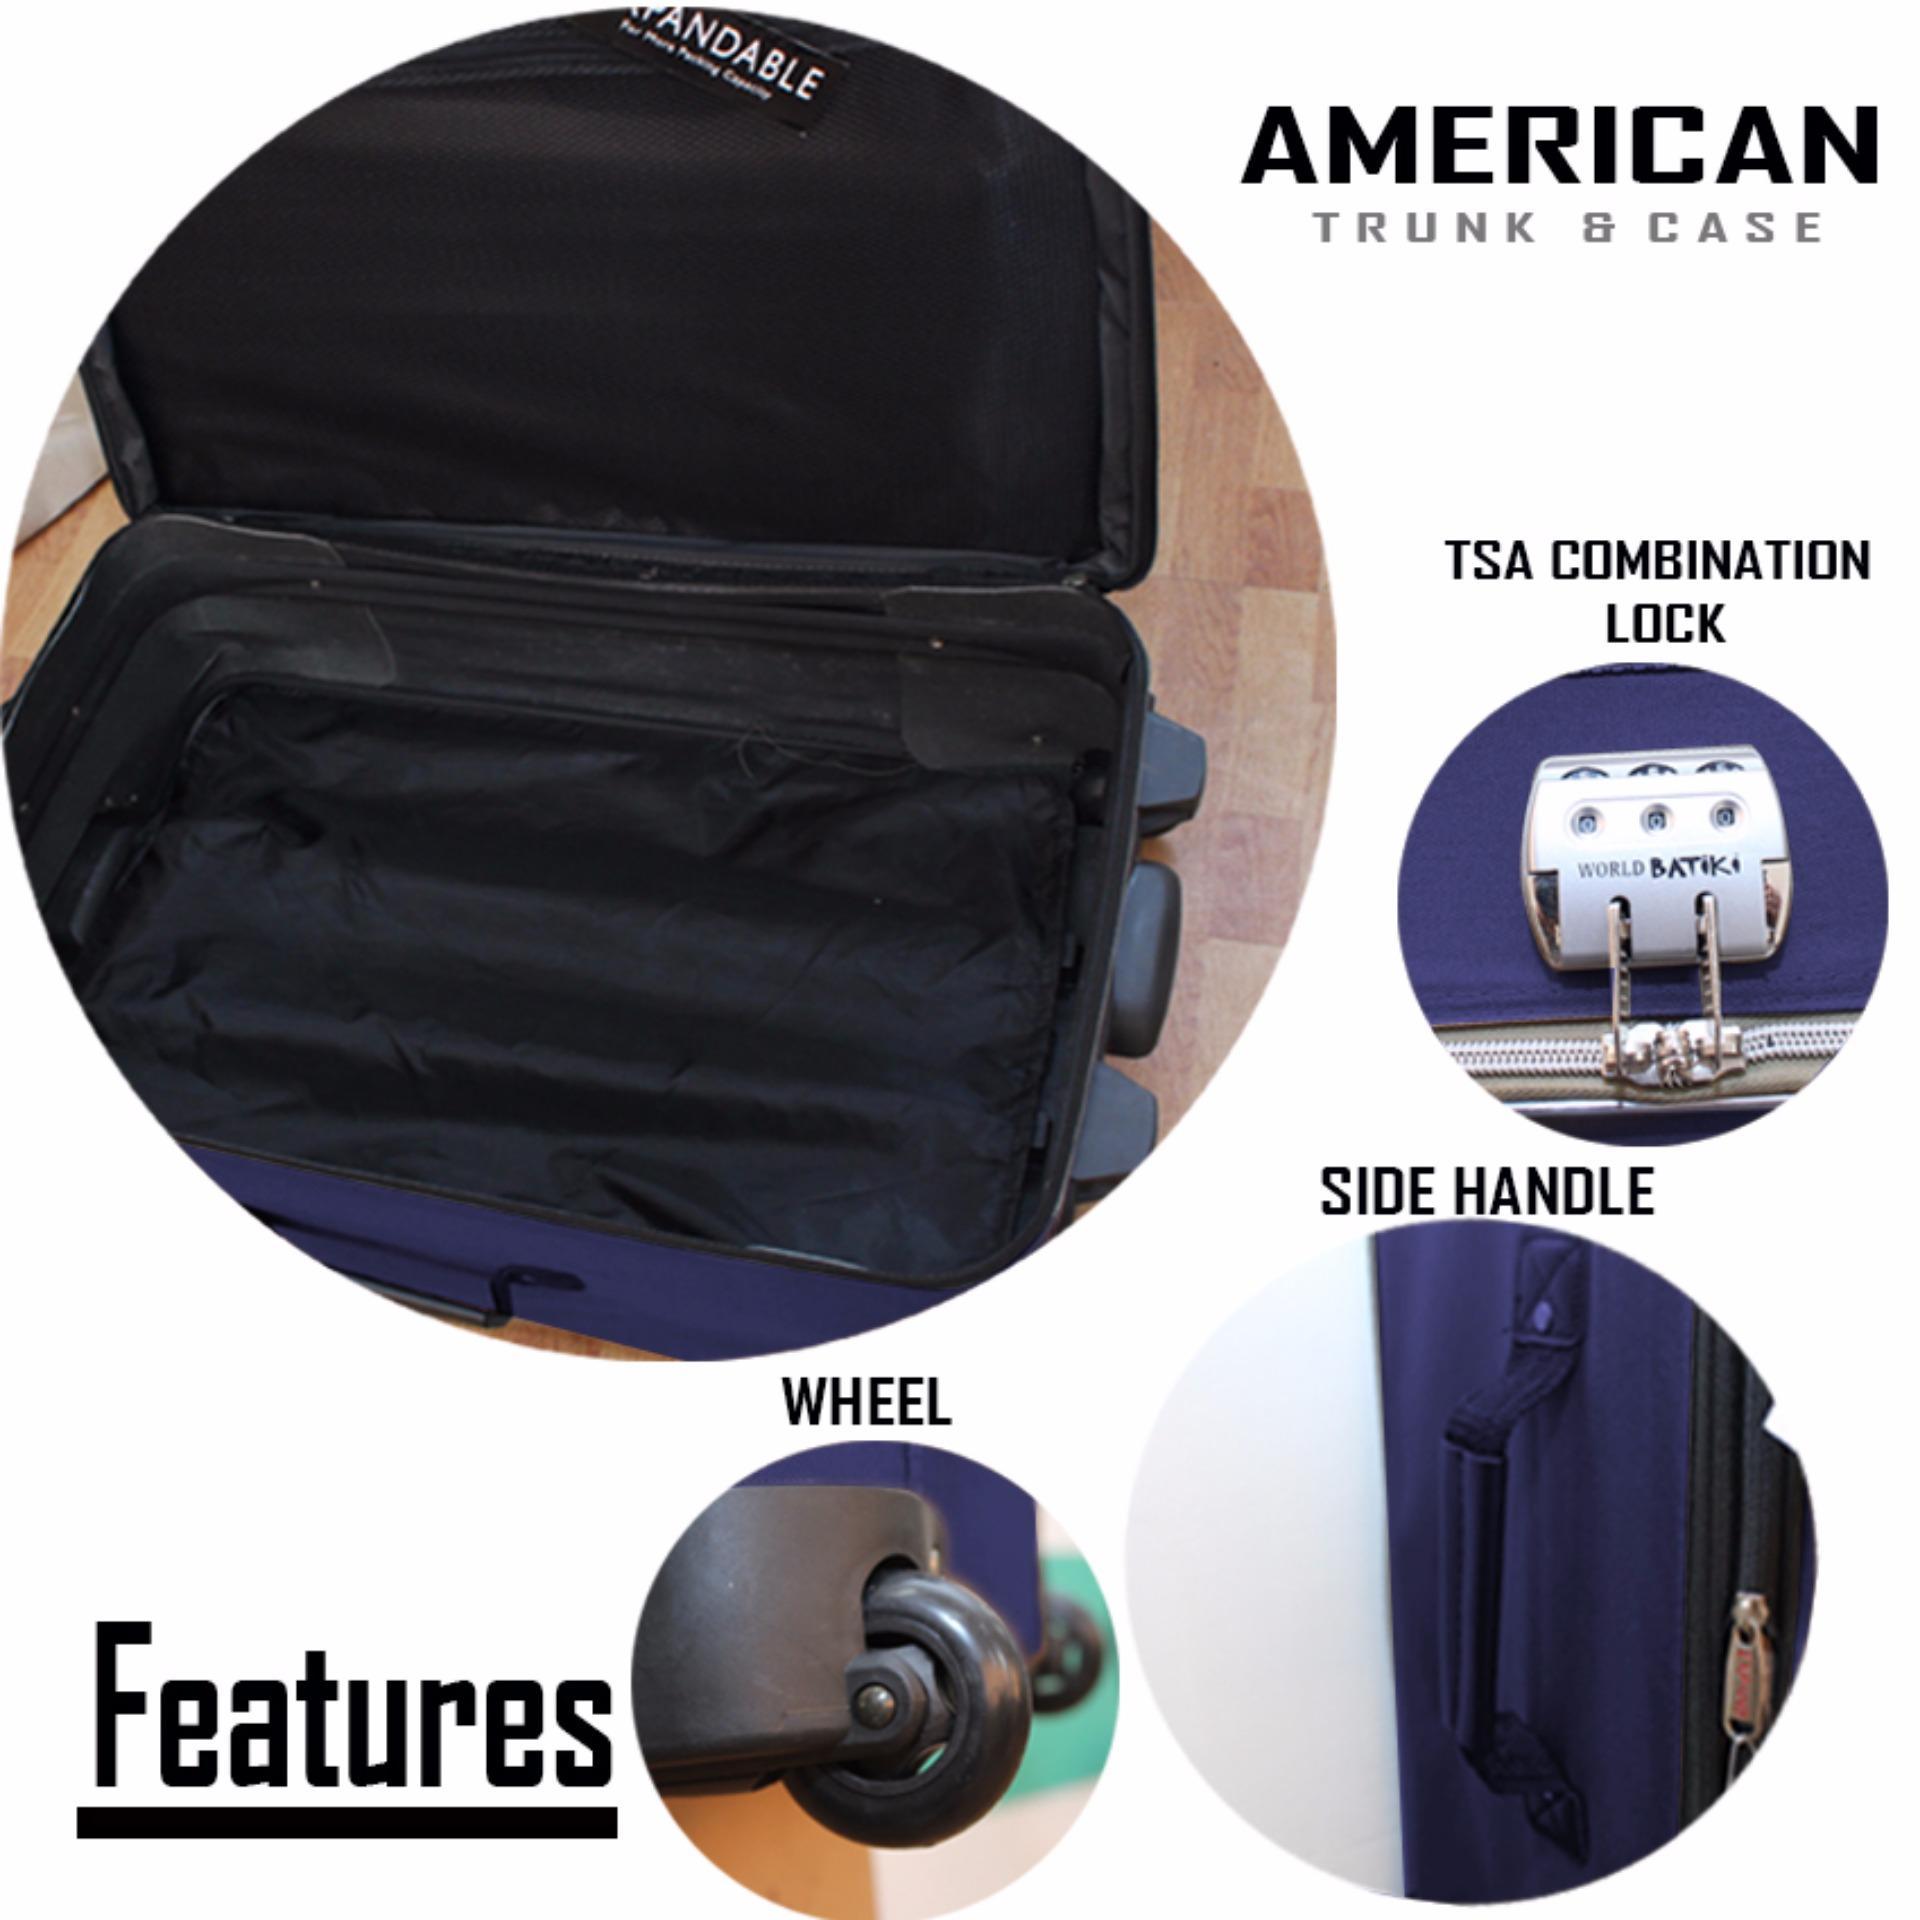 Brookstone Essentials American Trunk & Case Jackson Travel Luggage Set of 3 SIZE (15